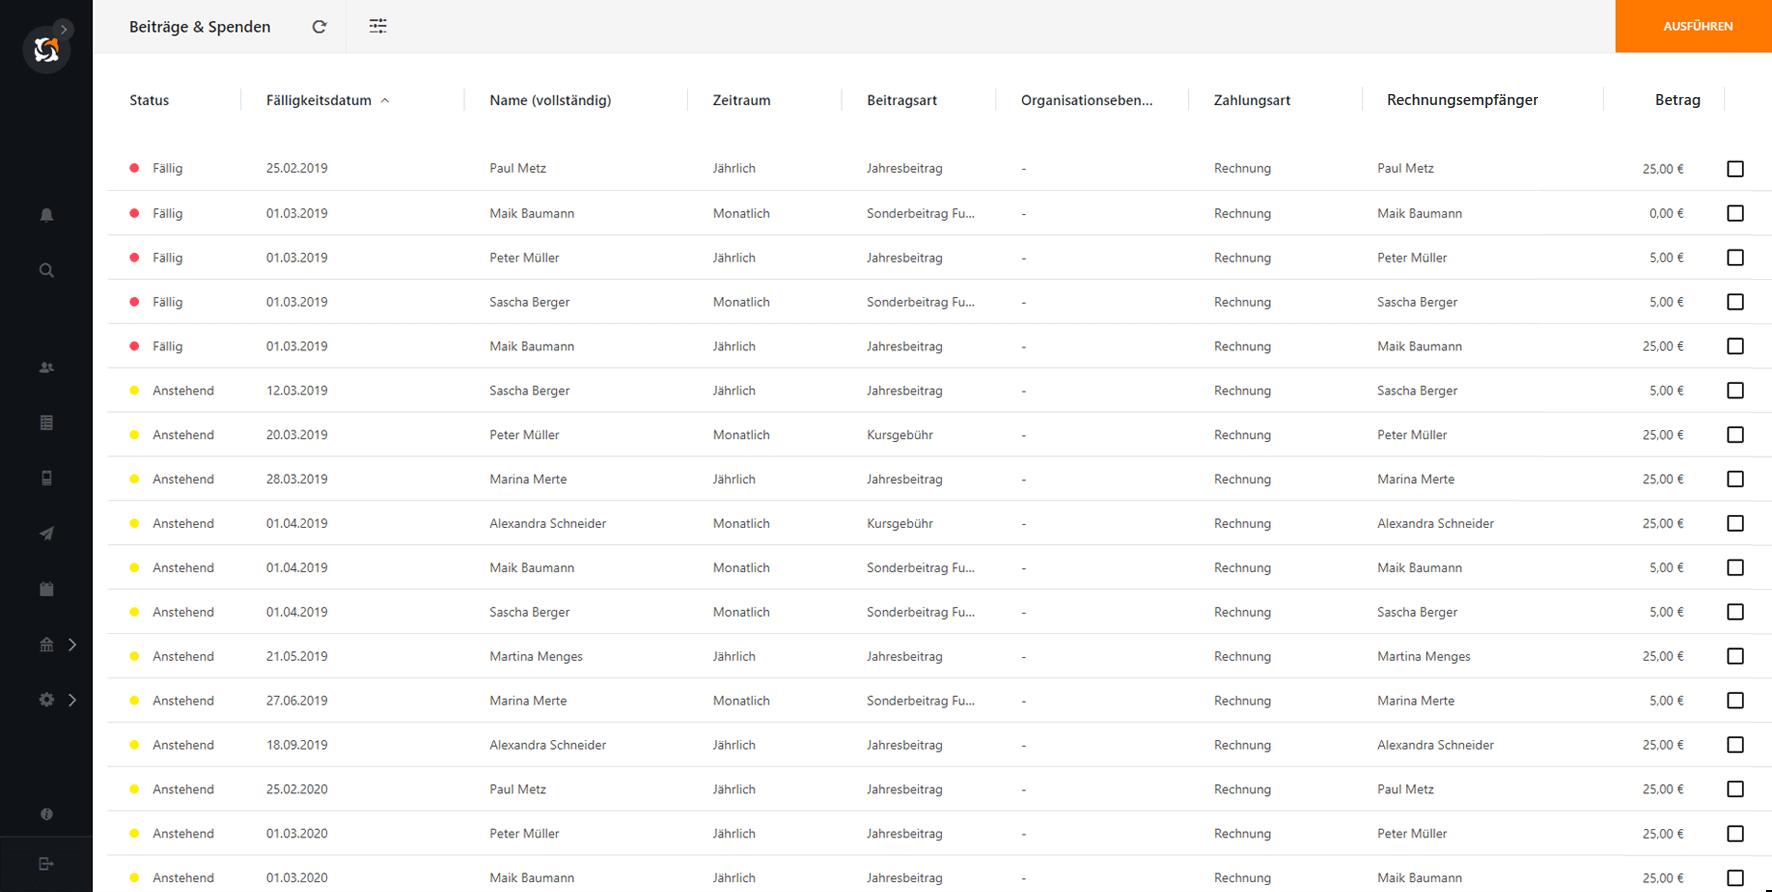 Liste anstehender Beiträge